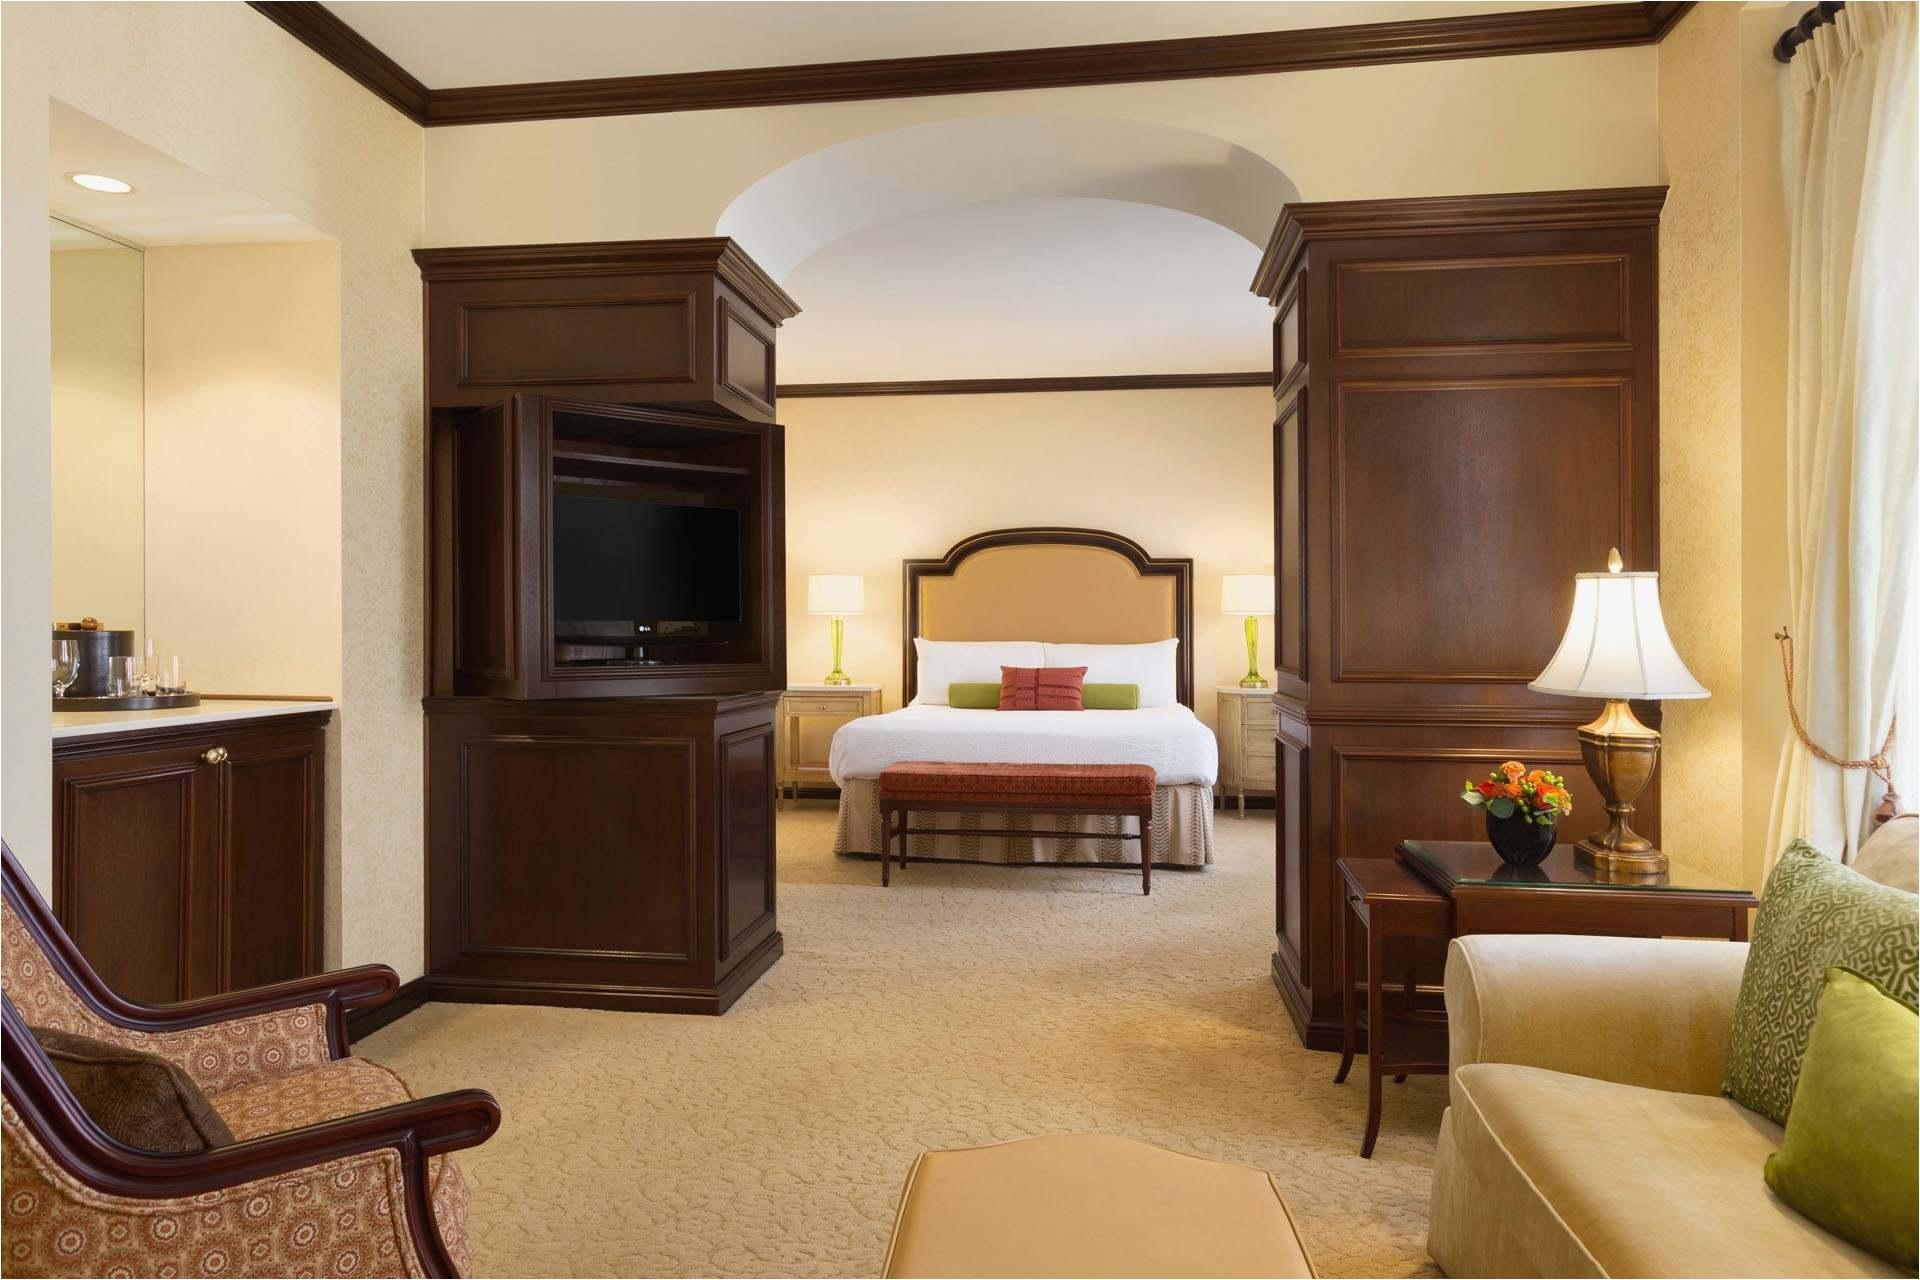 26 one bedroom apartments richmond va premium bedroom simple 2 bedroom suites richmond va decorate ideas